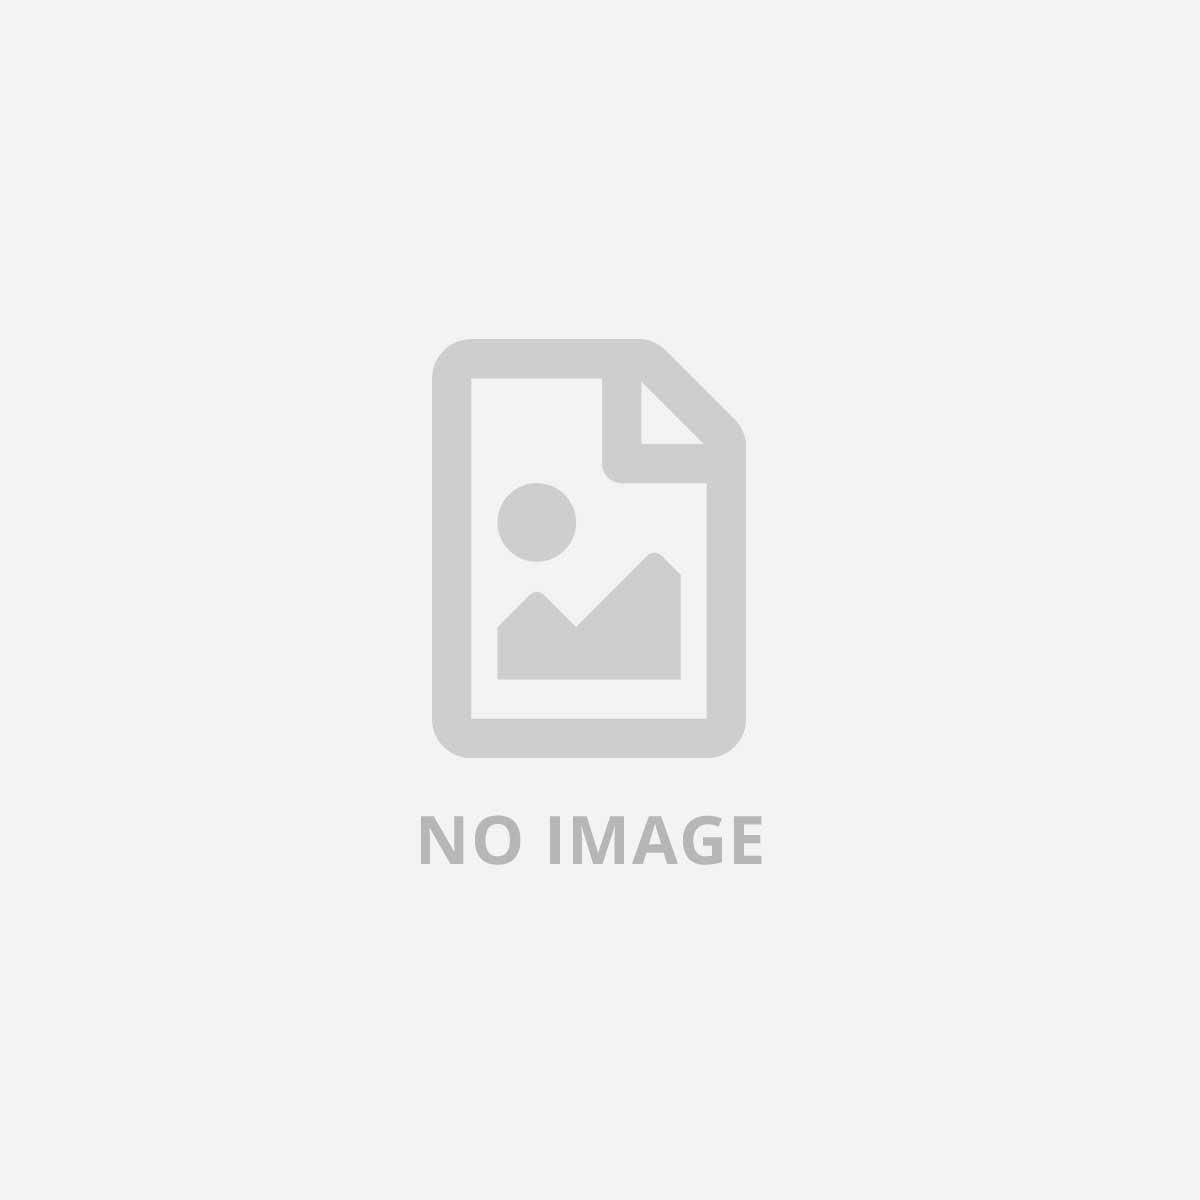 SOPAR TABULA PHONE T4 BLACK